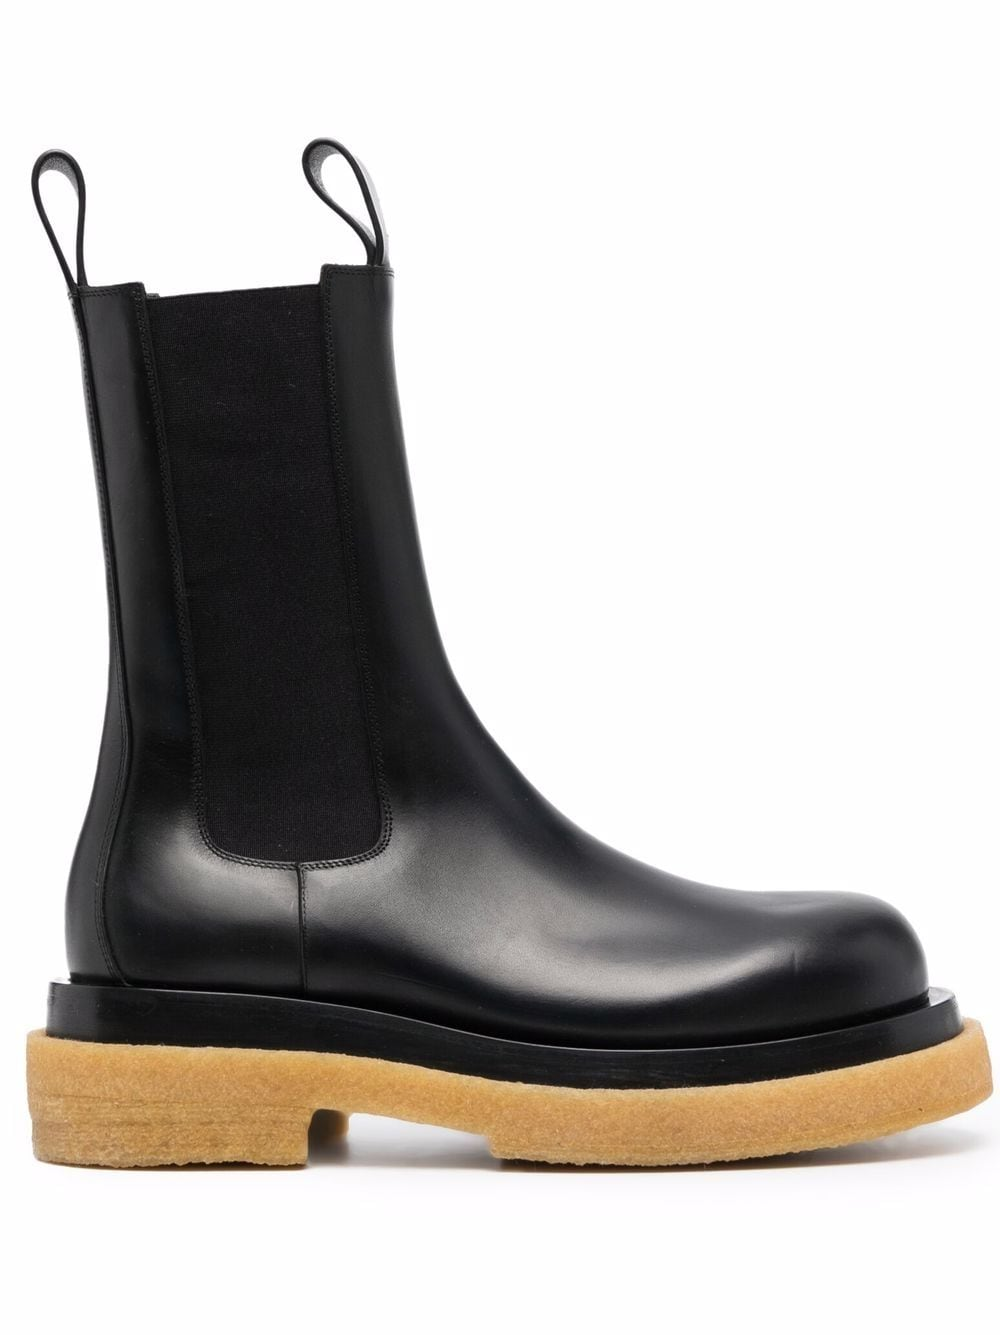 Picture of Bottega Veneta | The Lug Slip-On Boots